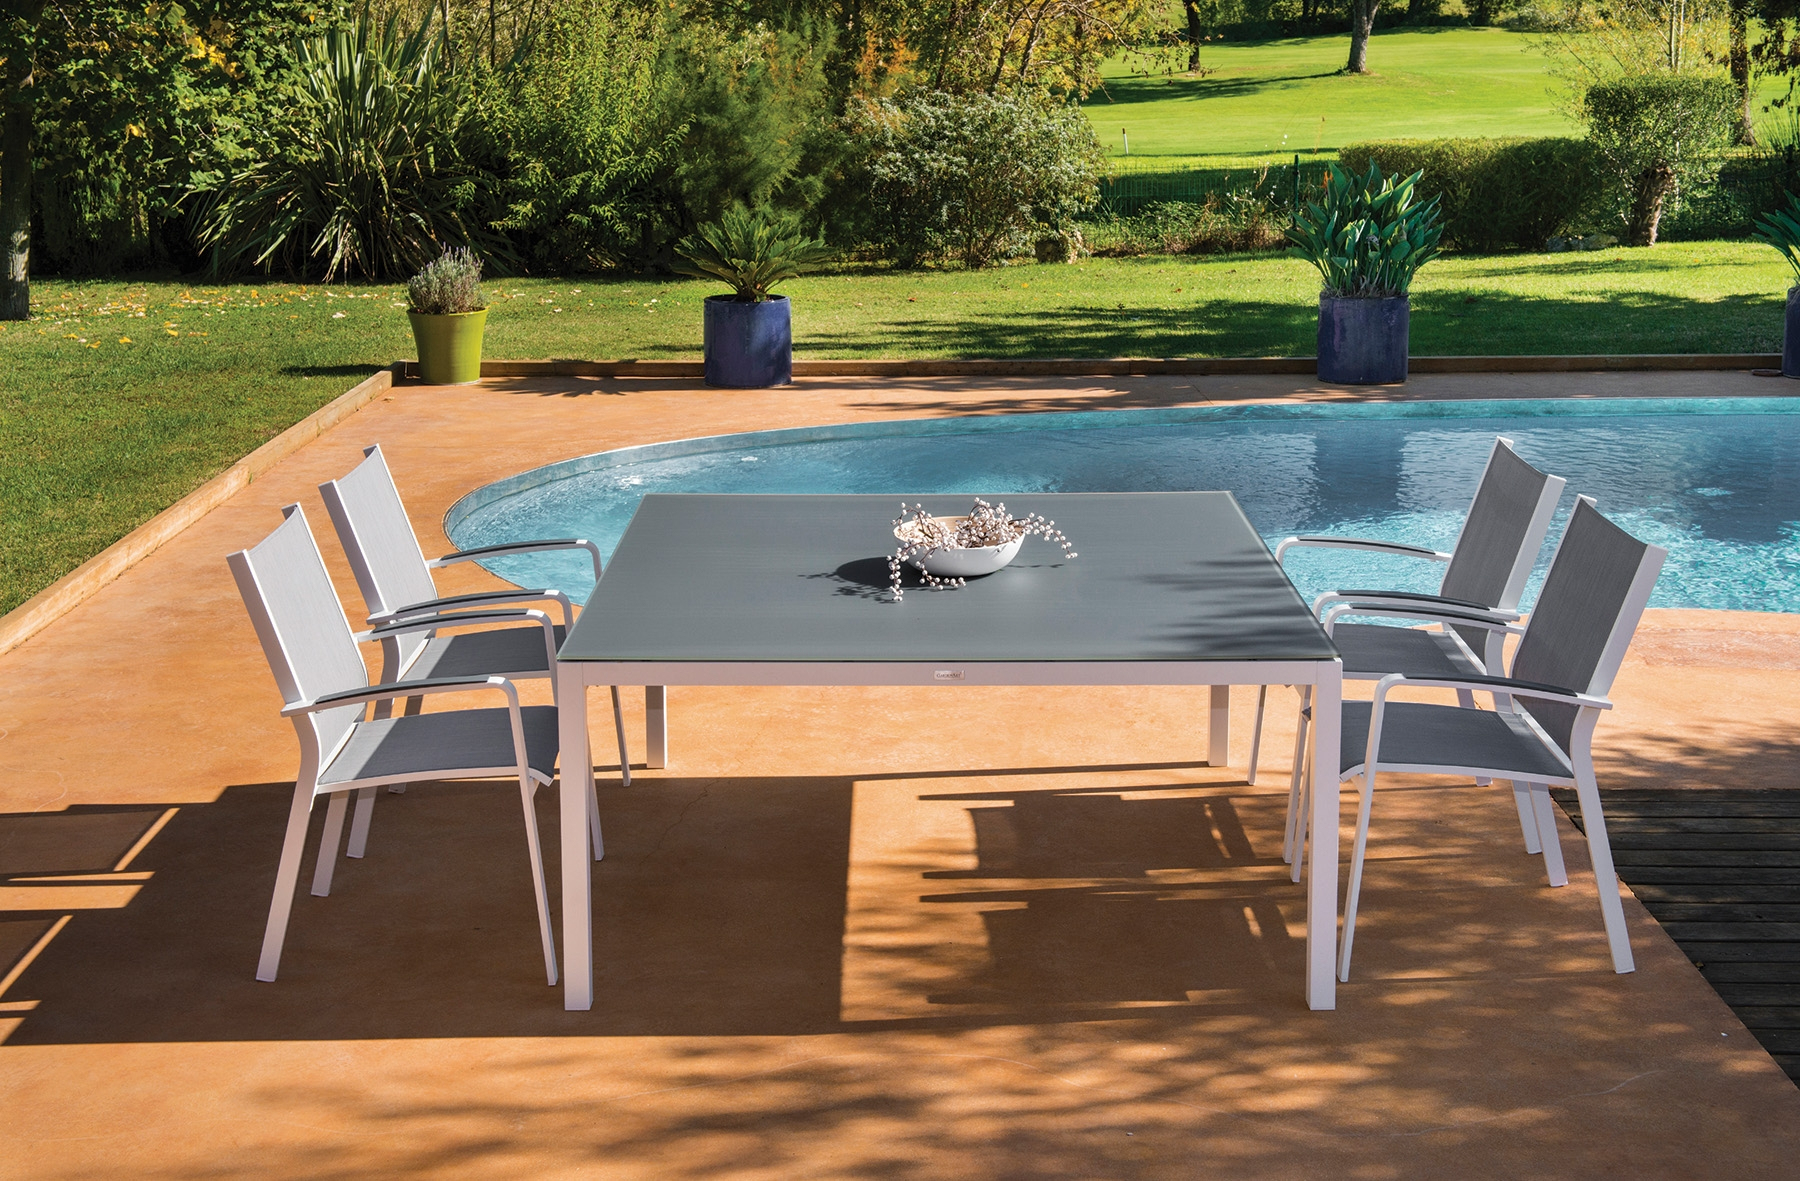 Table De Jardin Carrée En Aluminium Et Verre De La ... encequiconcerne Table De Jardin Aluminium Et Verre